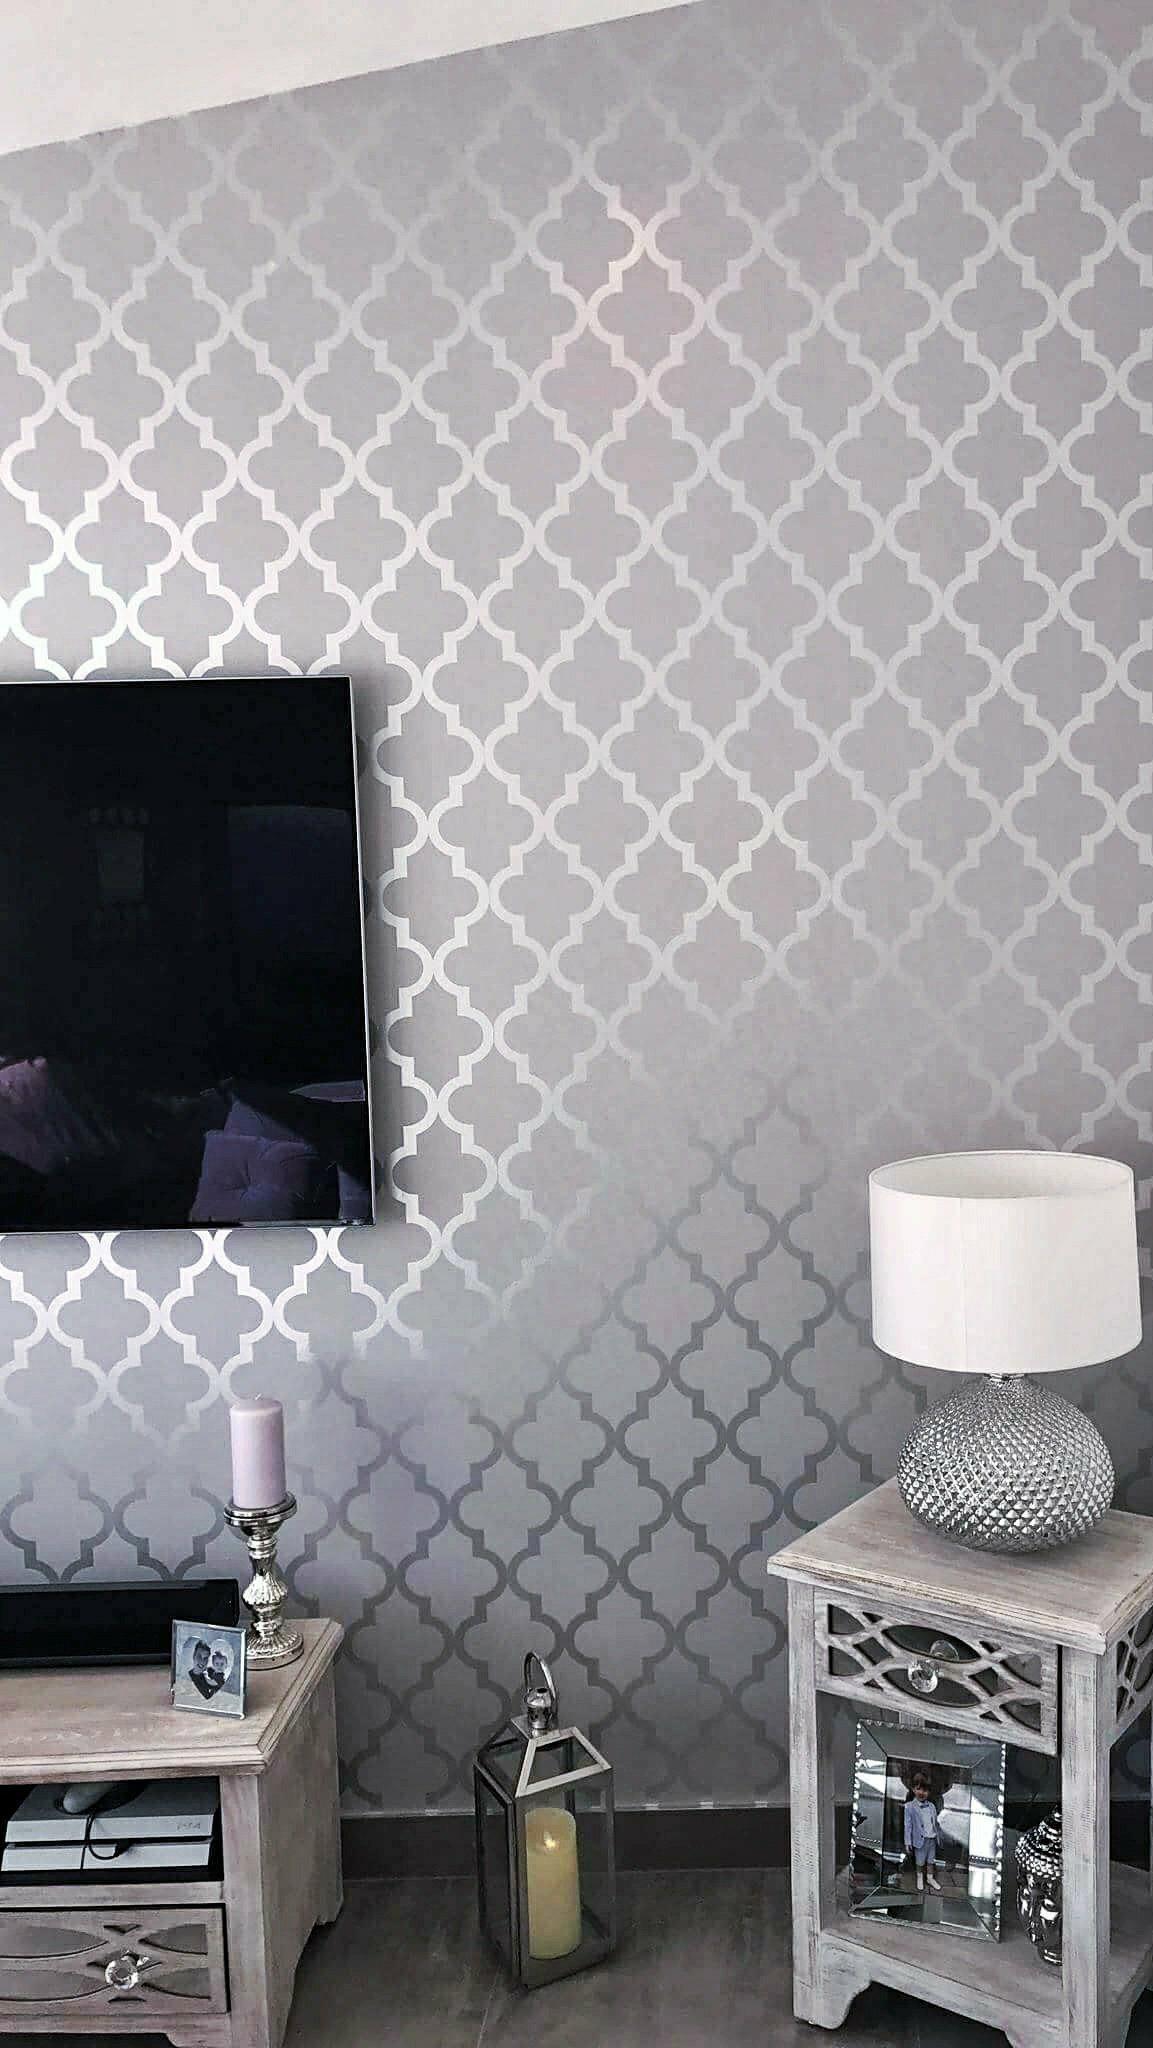 Henderson Interiors Camden Trellis Wallpaper Soft Grey Silver H980527 A Beautiful Unique Twist To Co Tapete Wohnzimmer Silberne Tapete Tapete Schlafzimmer